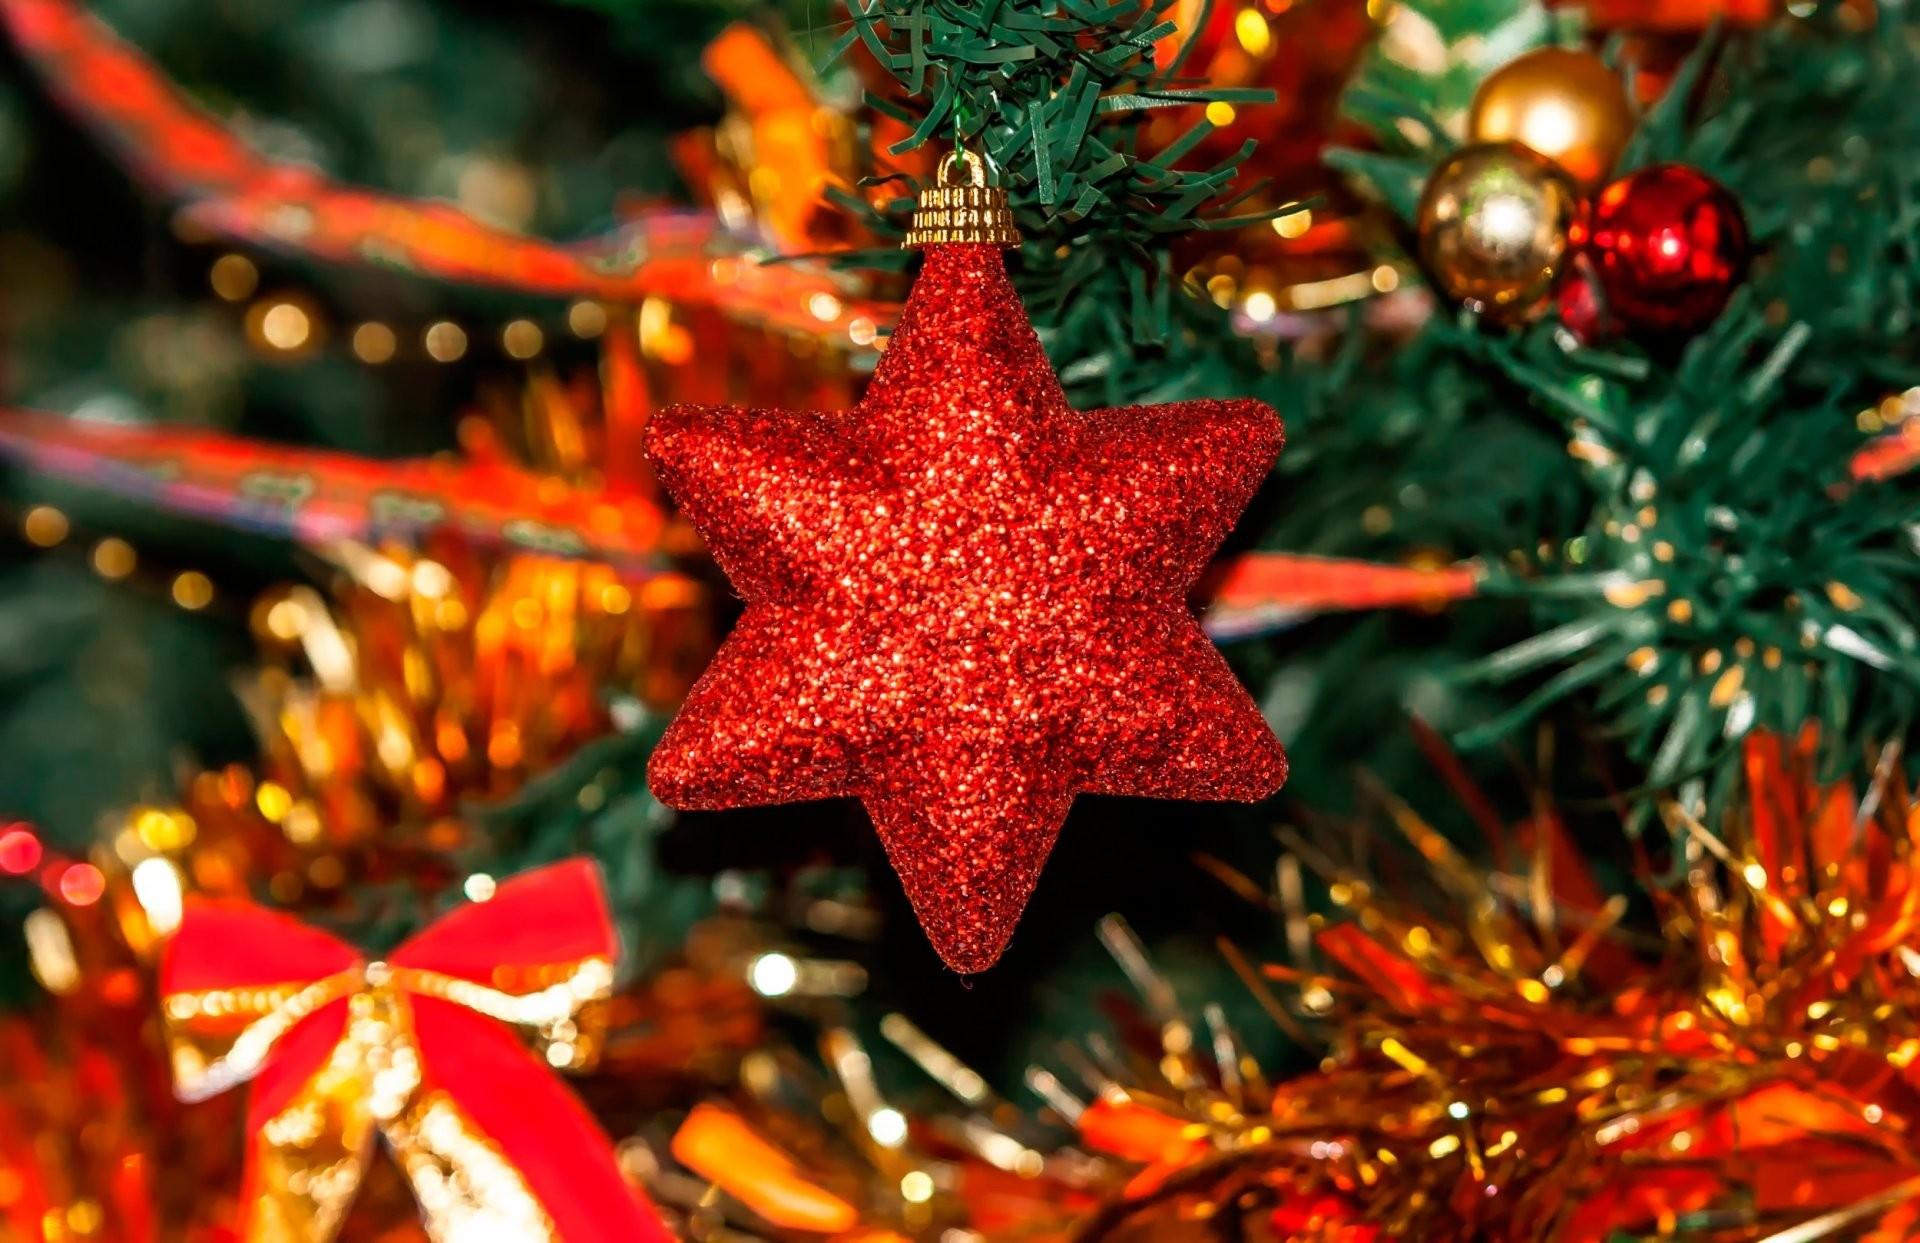 Image: Star, red, tinsel, tree, decoration